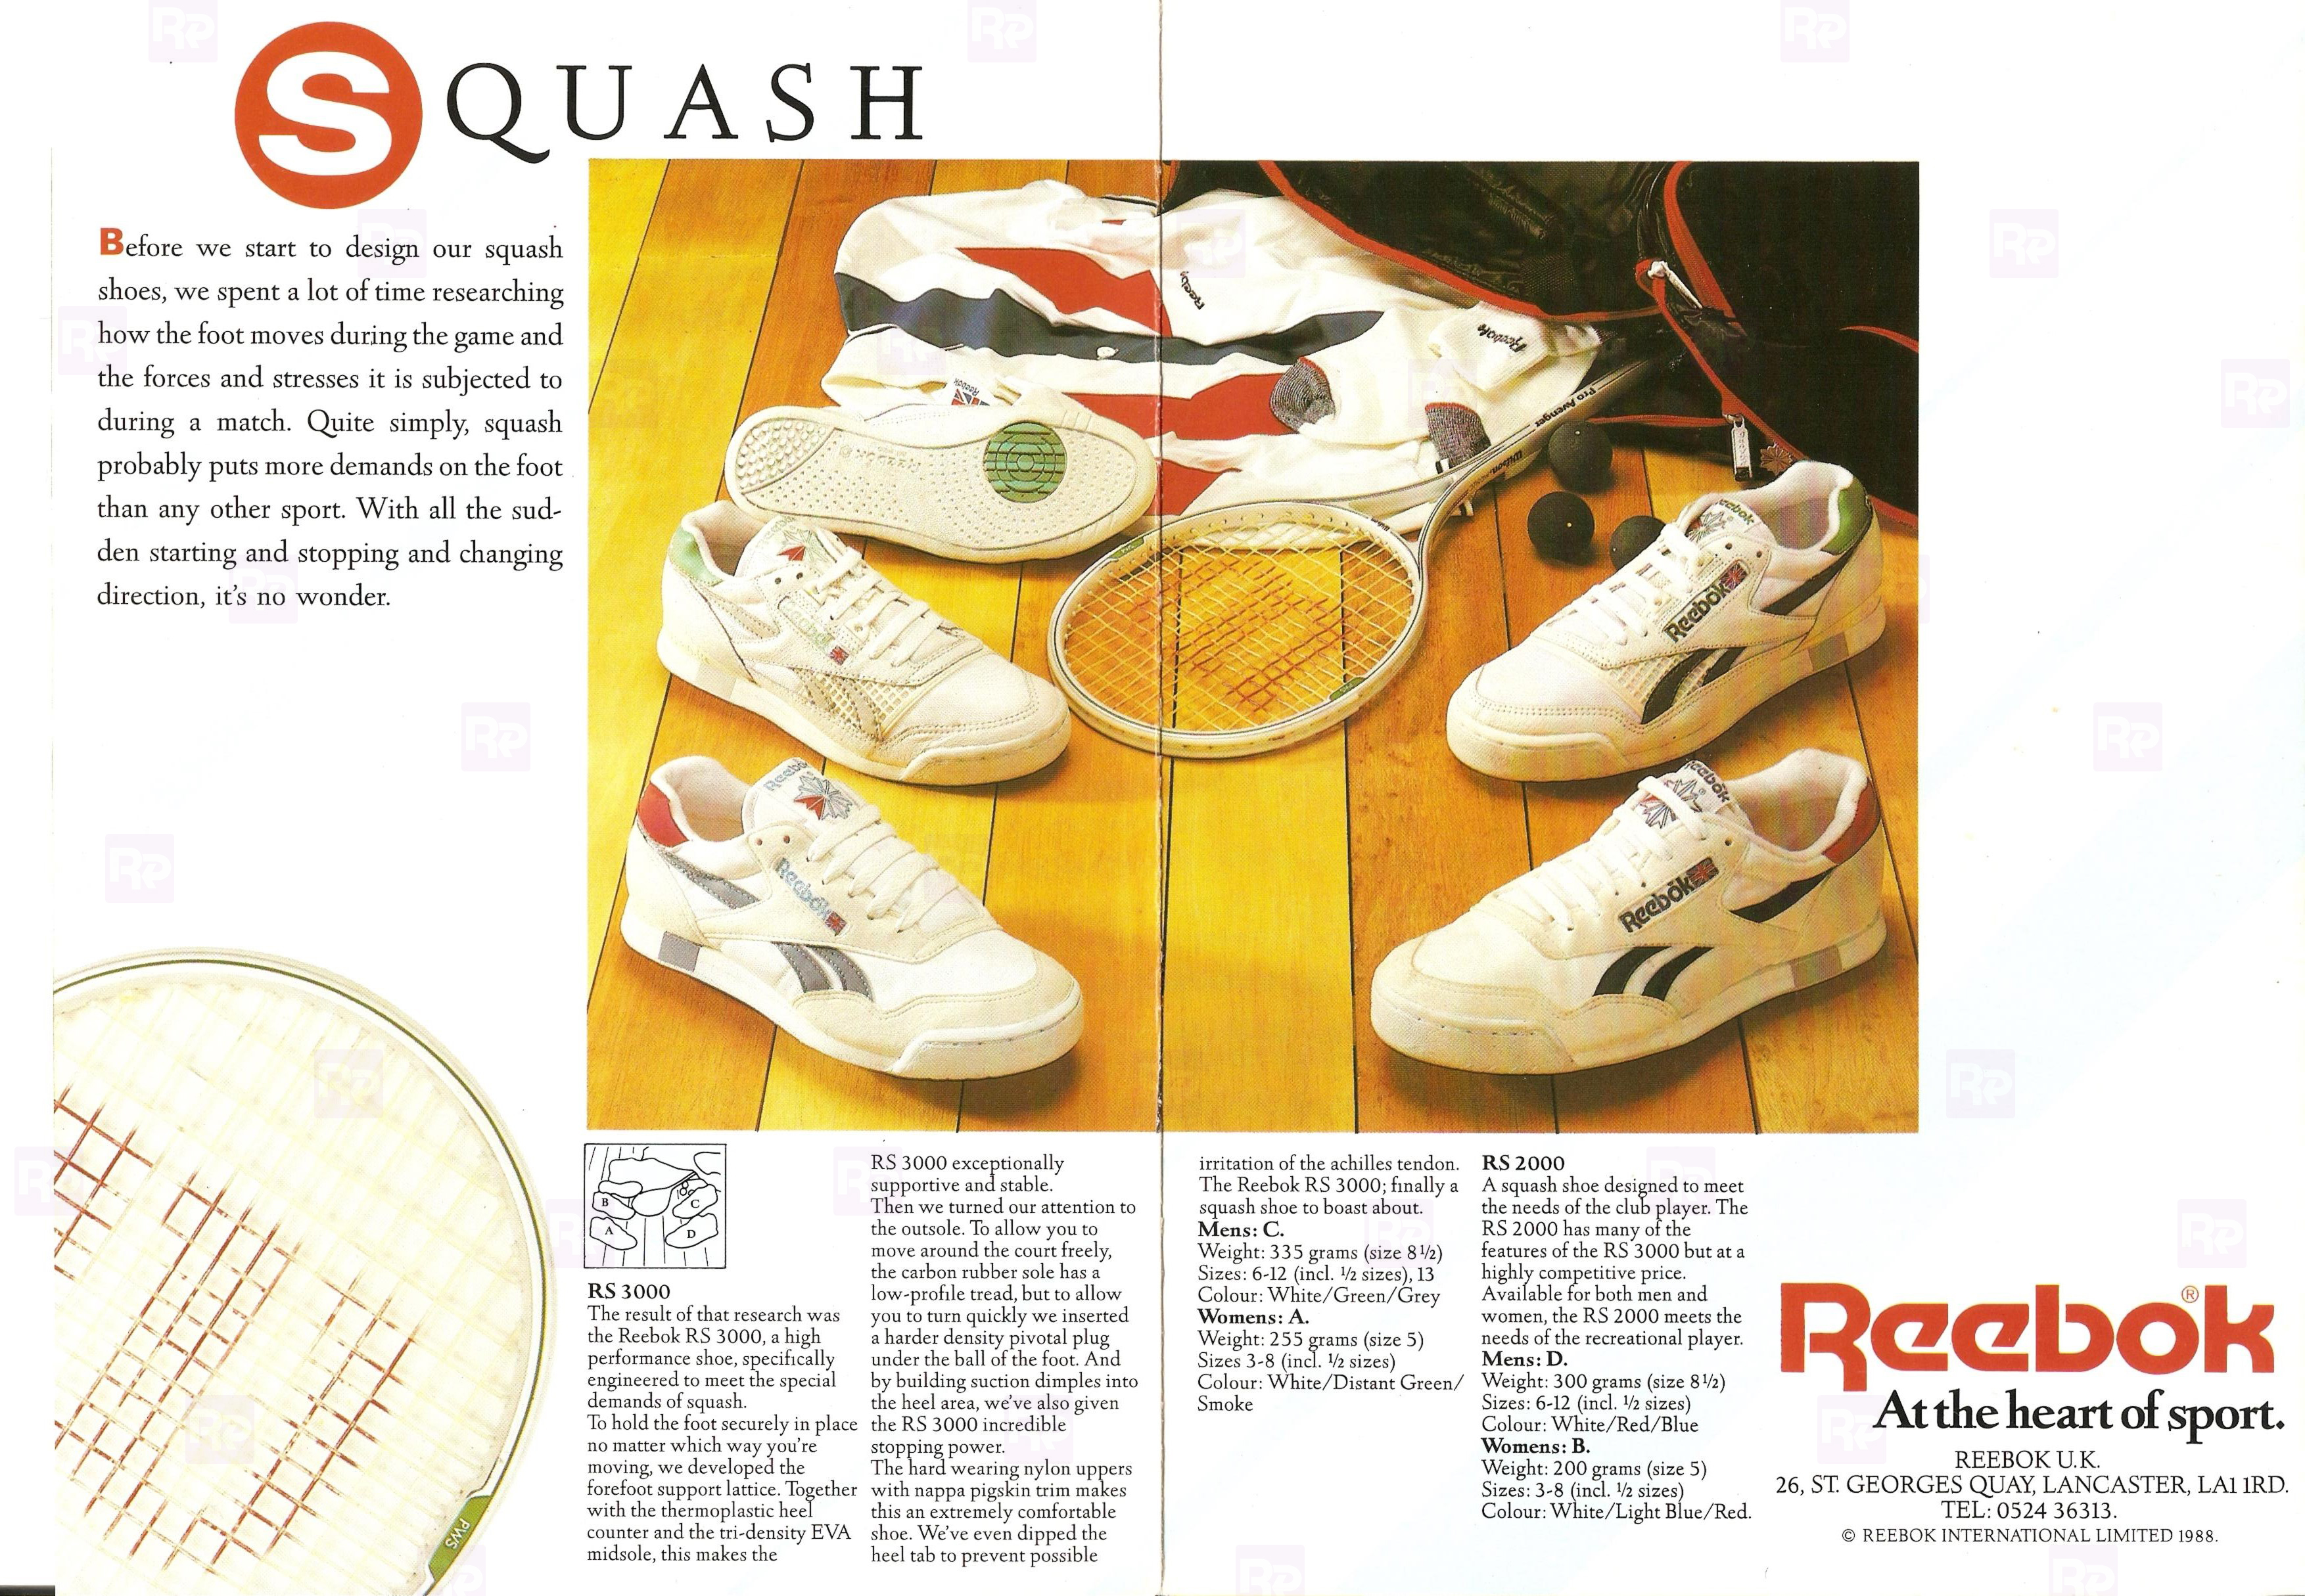 https://retrobok.files.wordpress.com/2013/02/reebok-racket-footwear-88_31.jpg